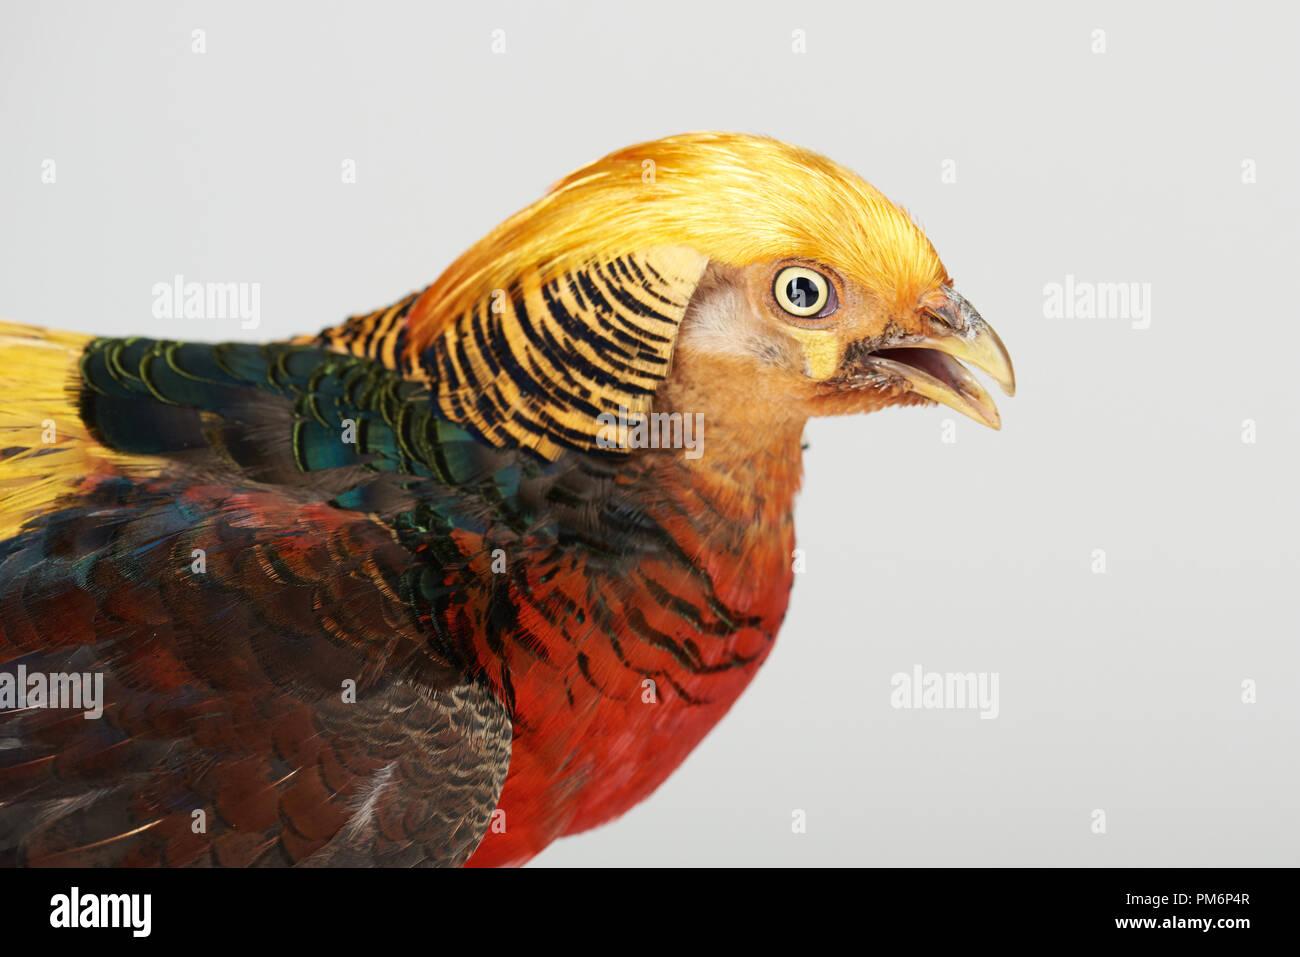 Profile portrait of pheasant bird isolated on white studio background - Stock Image